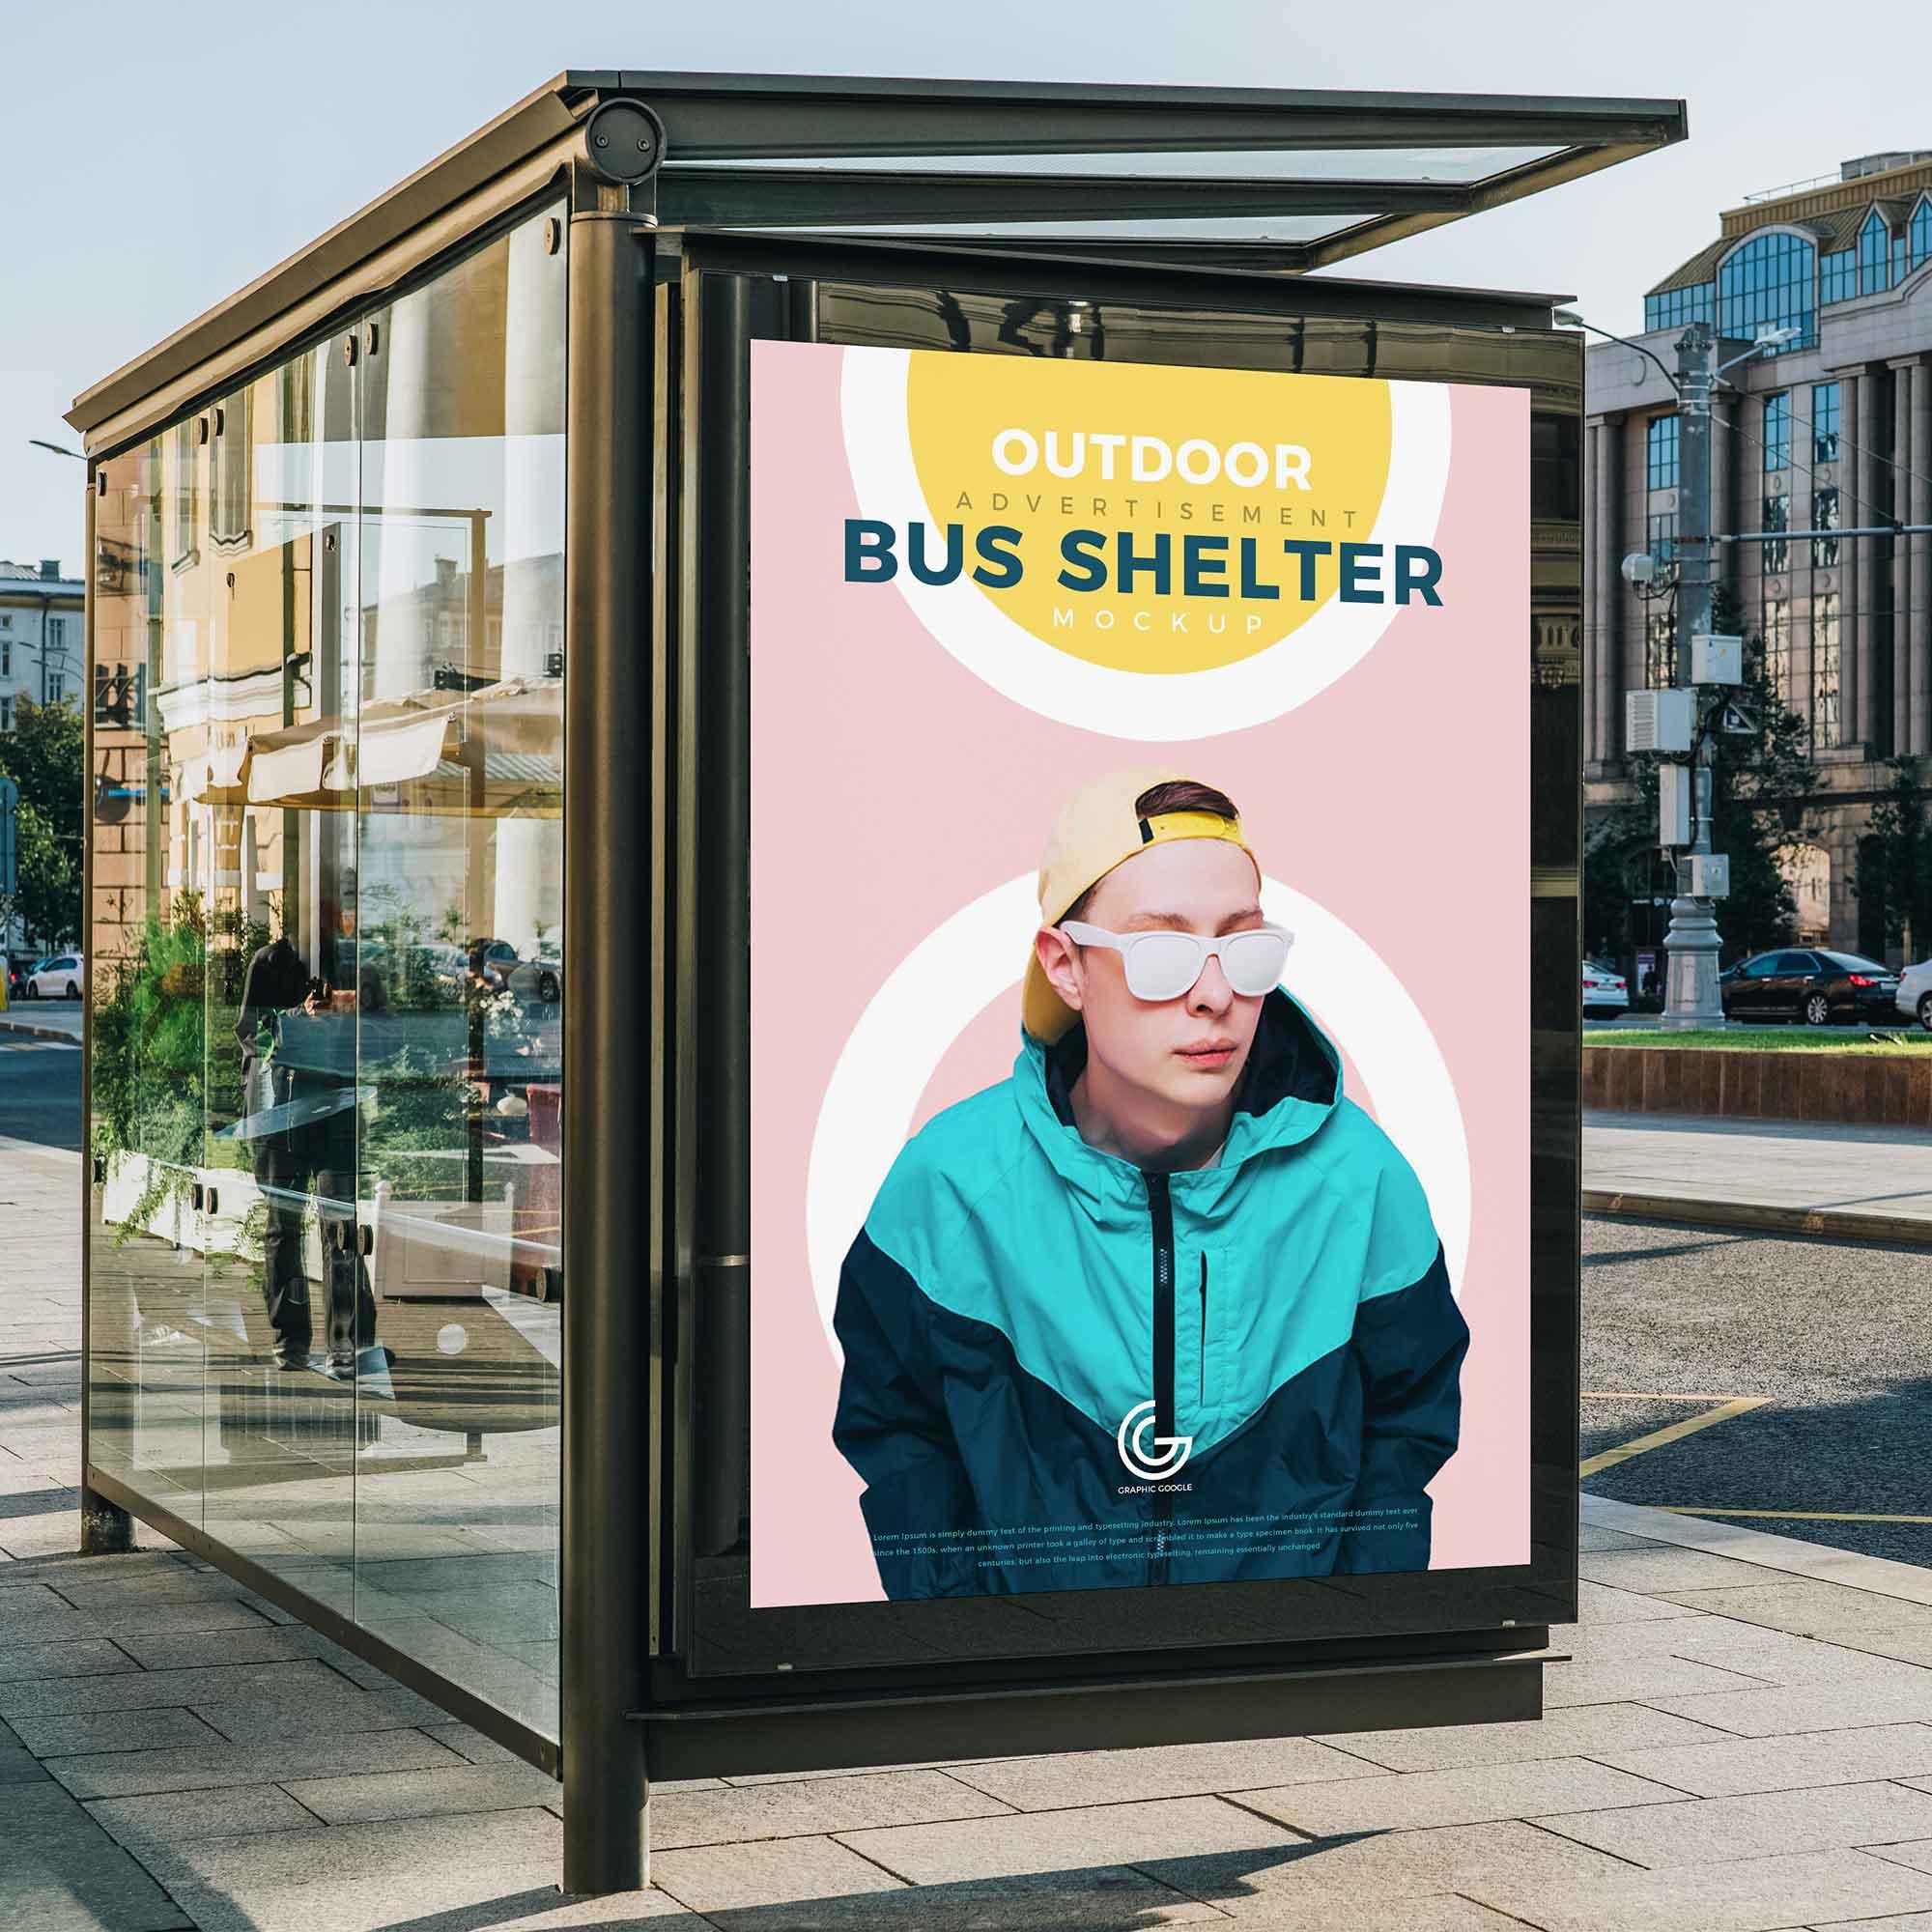 Outdoor Bus Shelter Advertisement Mockup